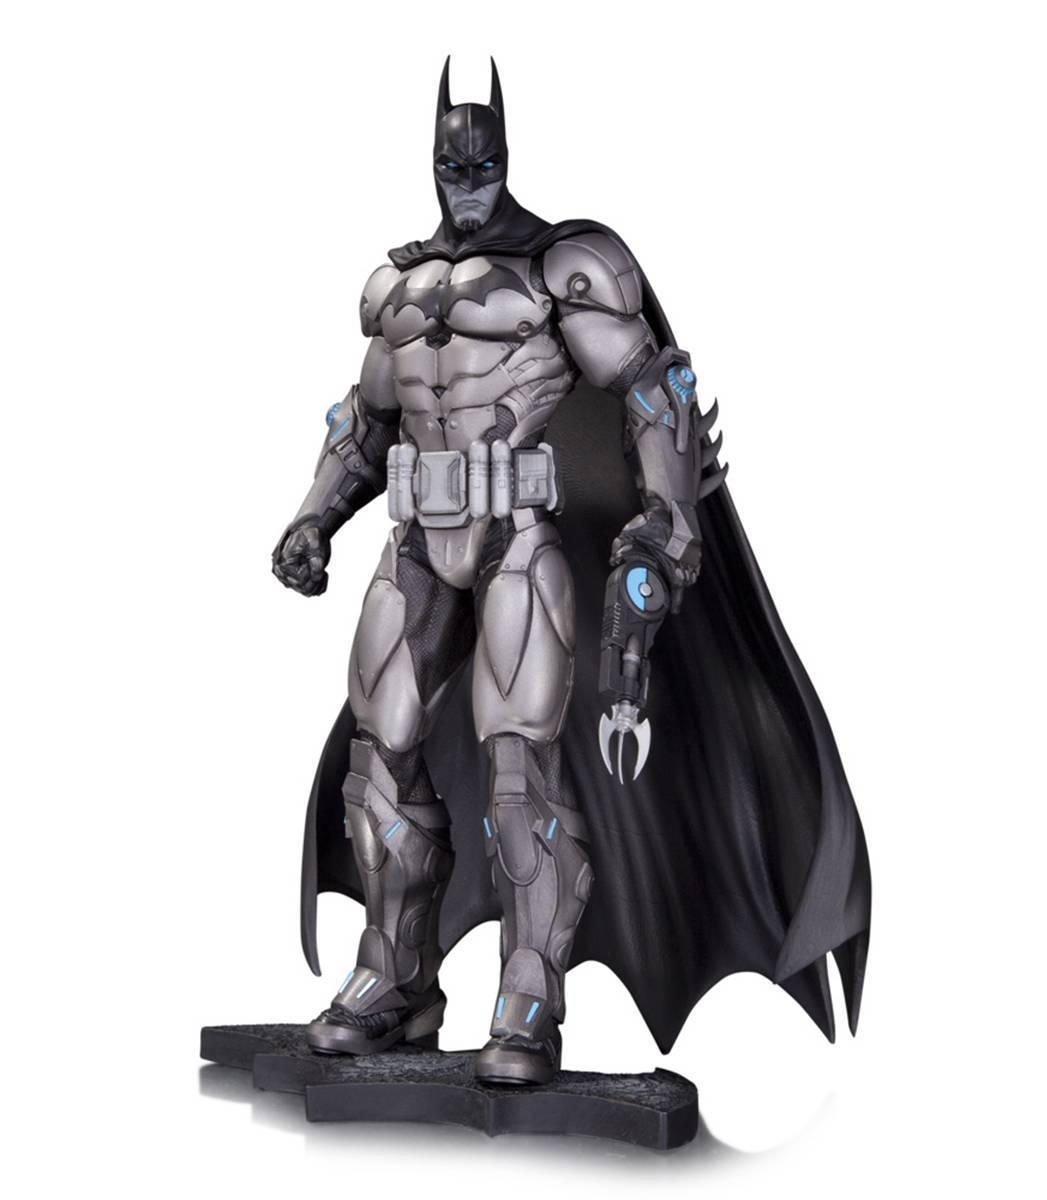 Фигурка Лечебница Аркхэм Бэтмен — Batman Armored Statue